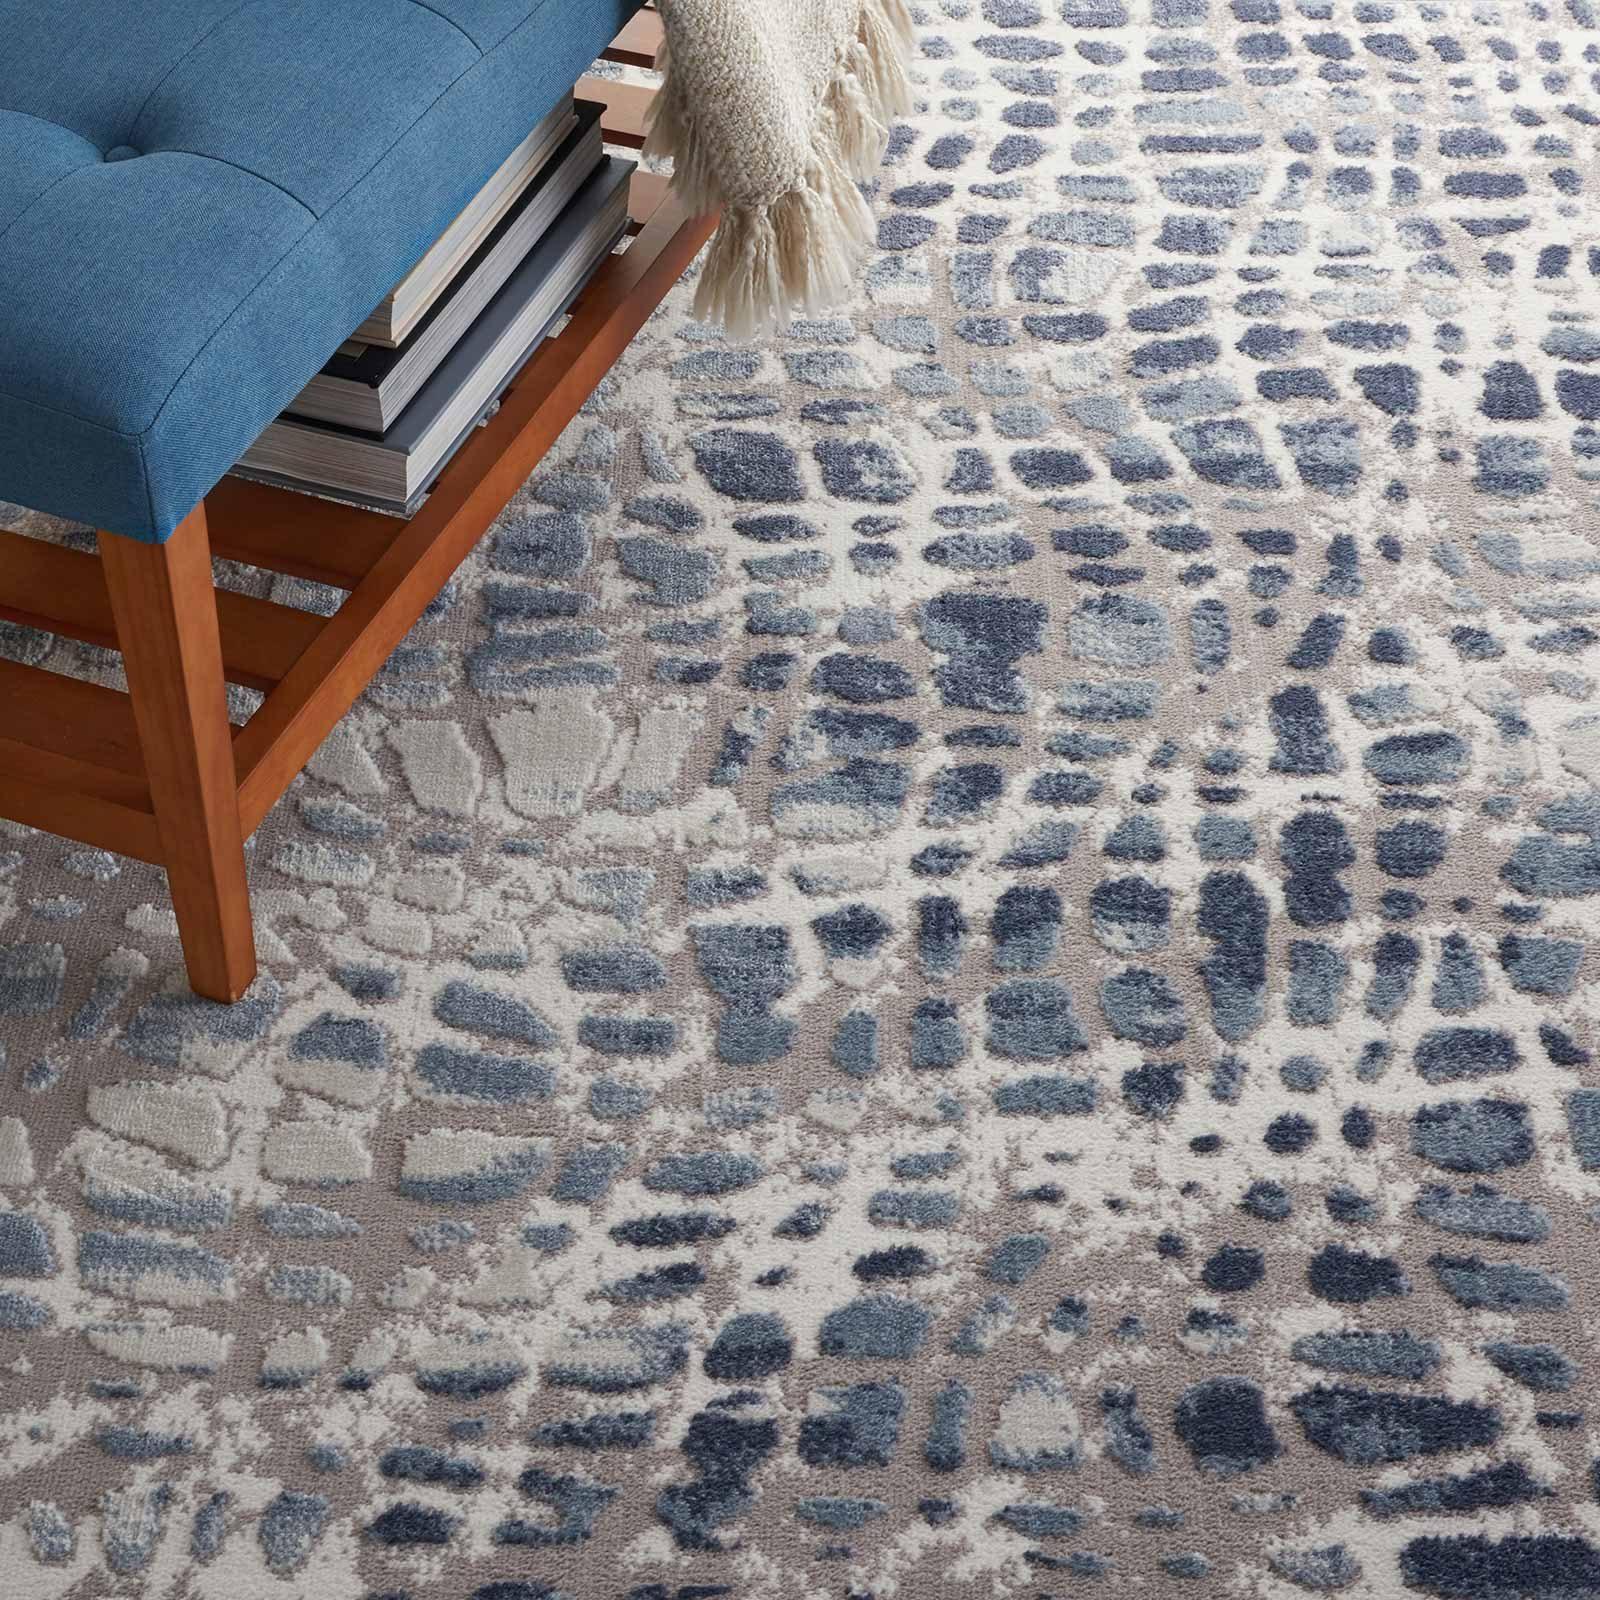 Nourison rug Urban Decor URD04 IVGRY 4x6 099446467102 interior 2 C